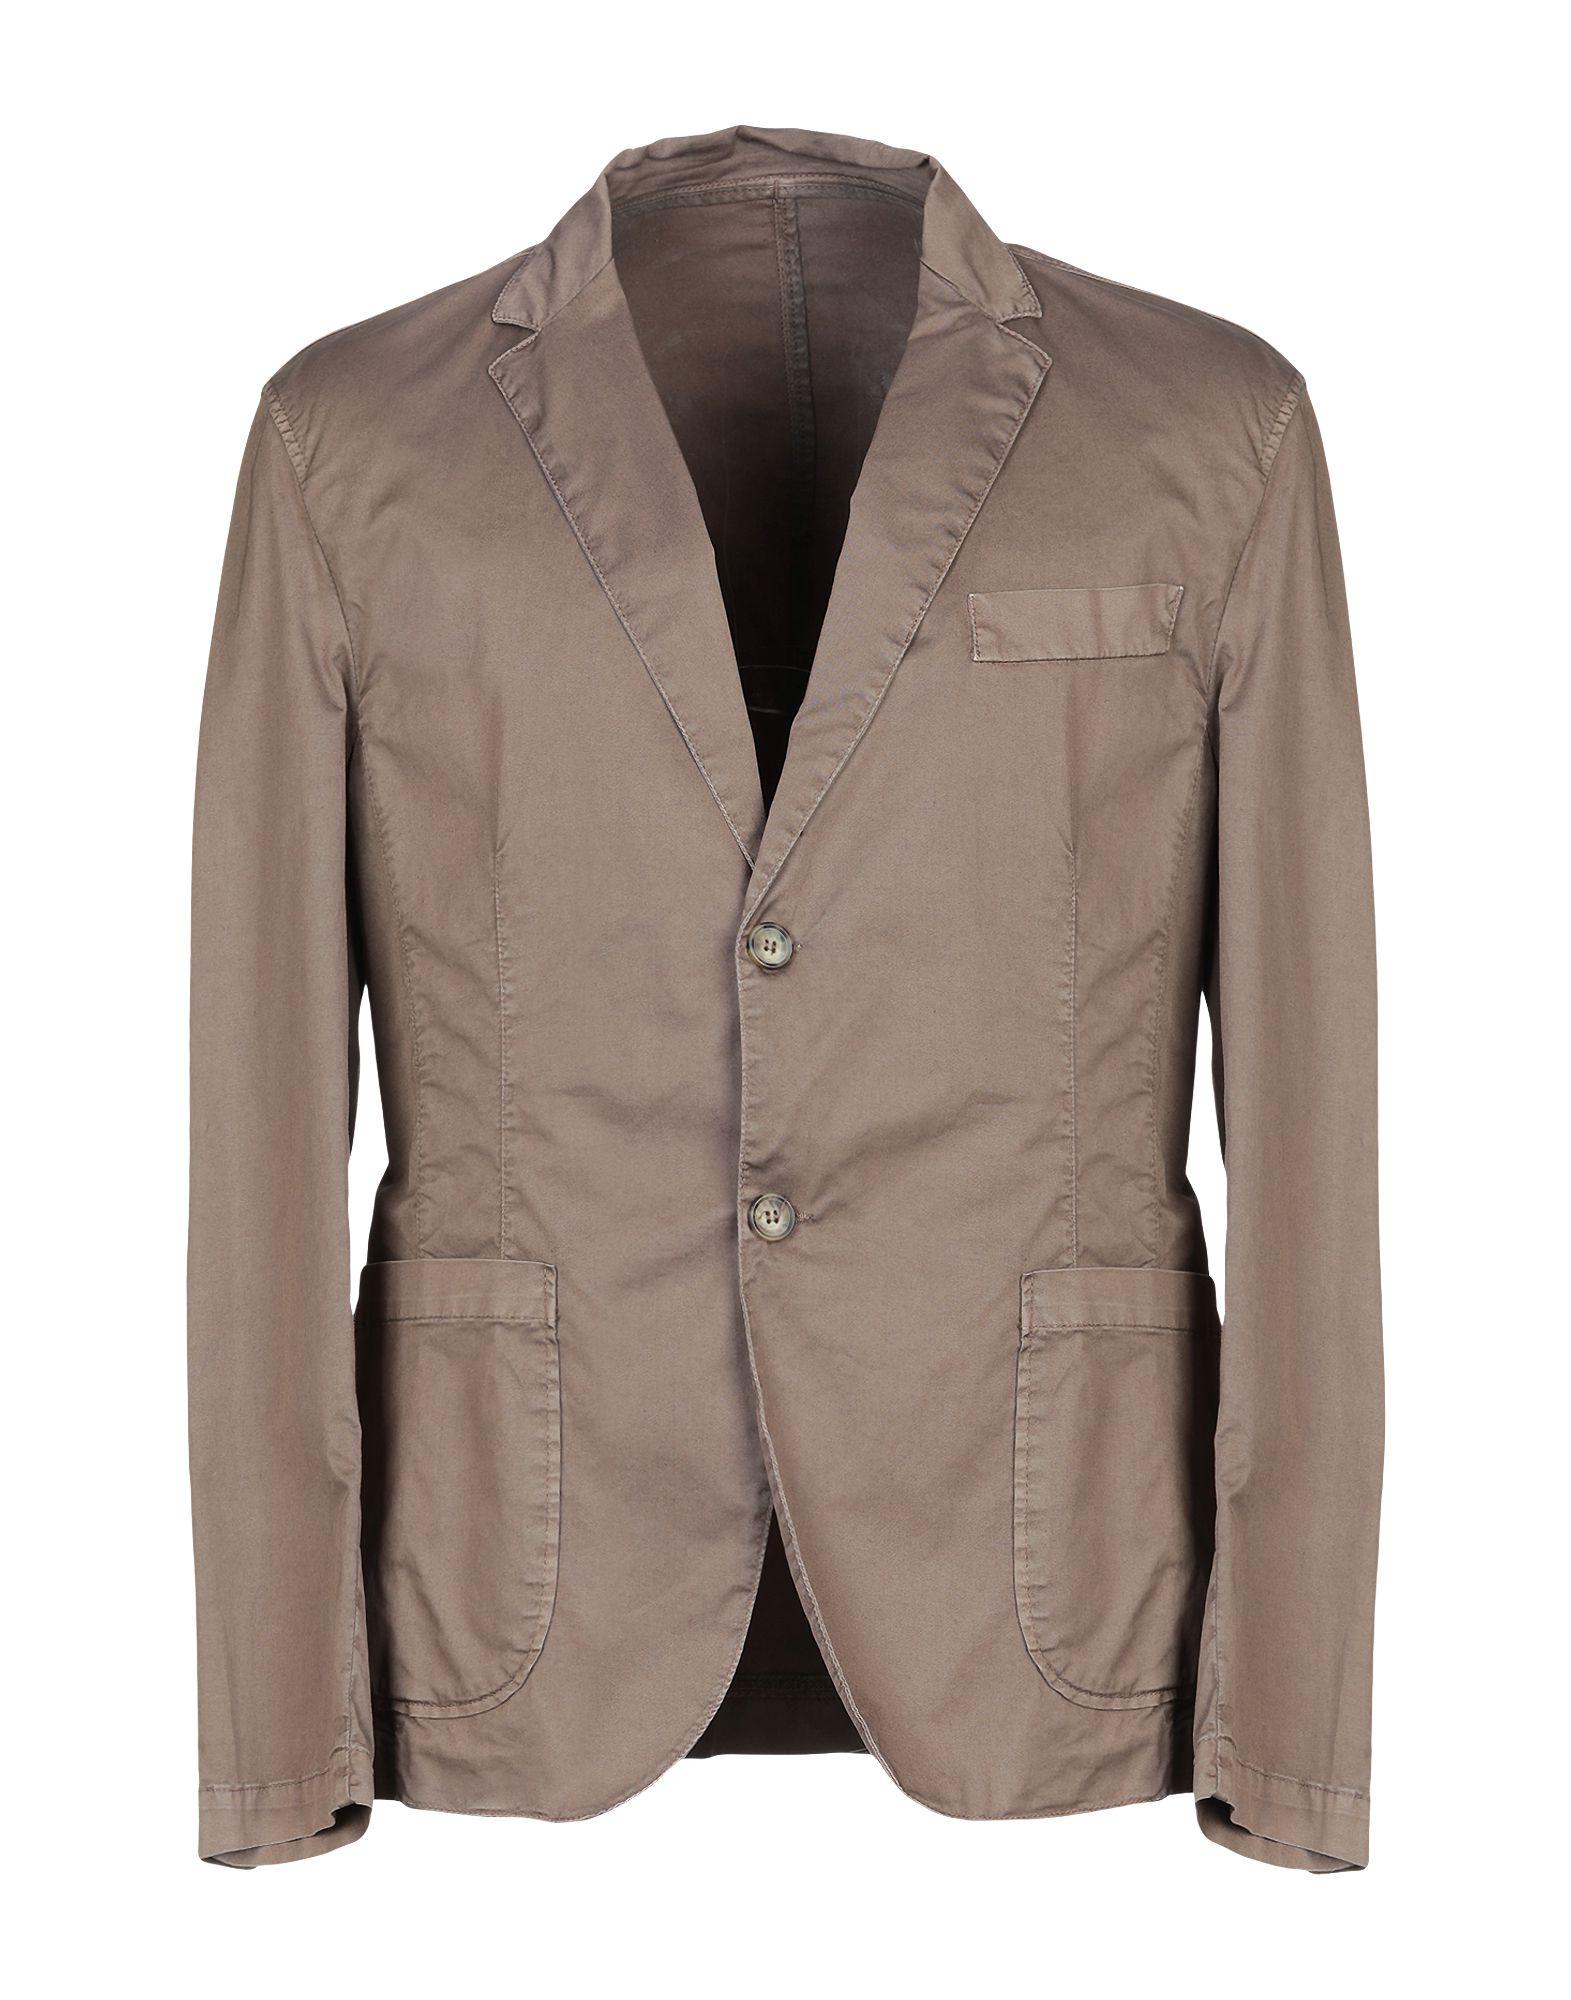 VICTOR COOL Пиджак s cool пиджак s cool для мальчика